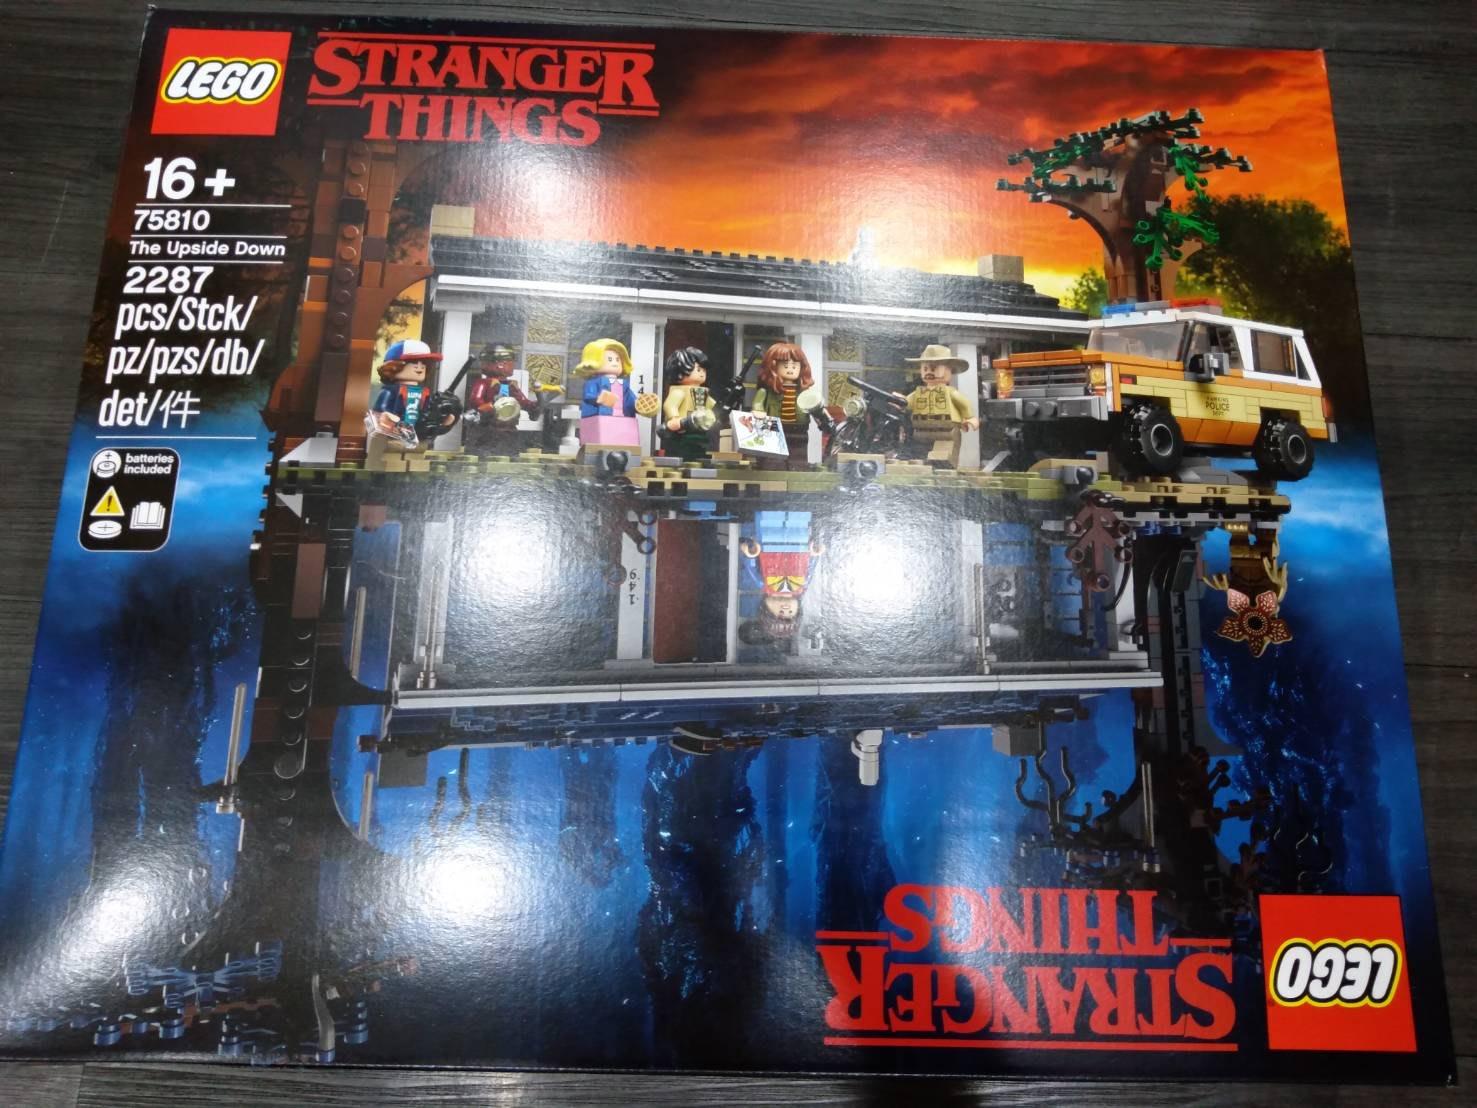 [現貨 公司貨] 75810 LEGO Netflix 怪奇物語-顛倒世界 The Upside Down 樂高